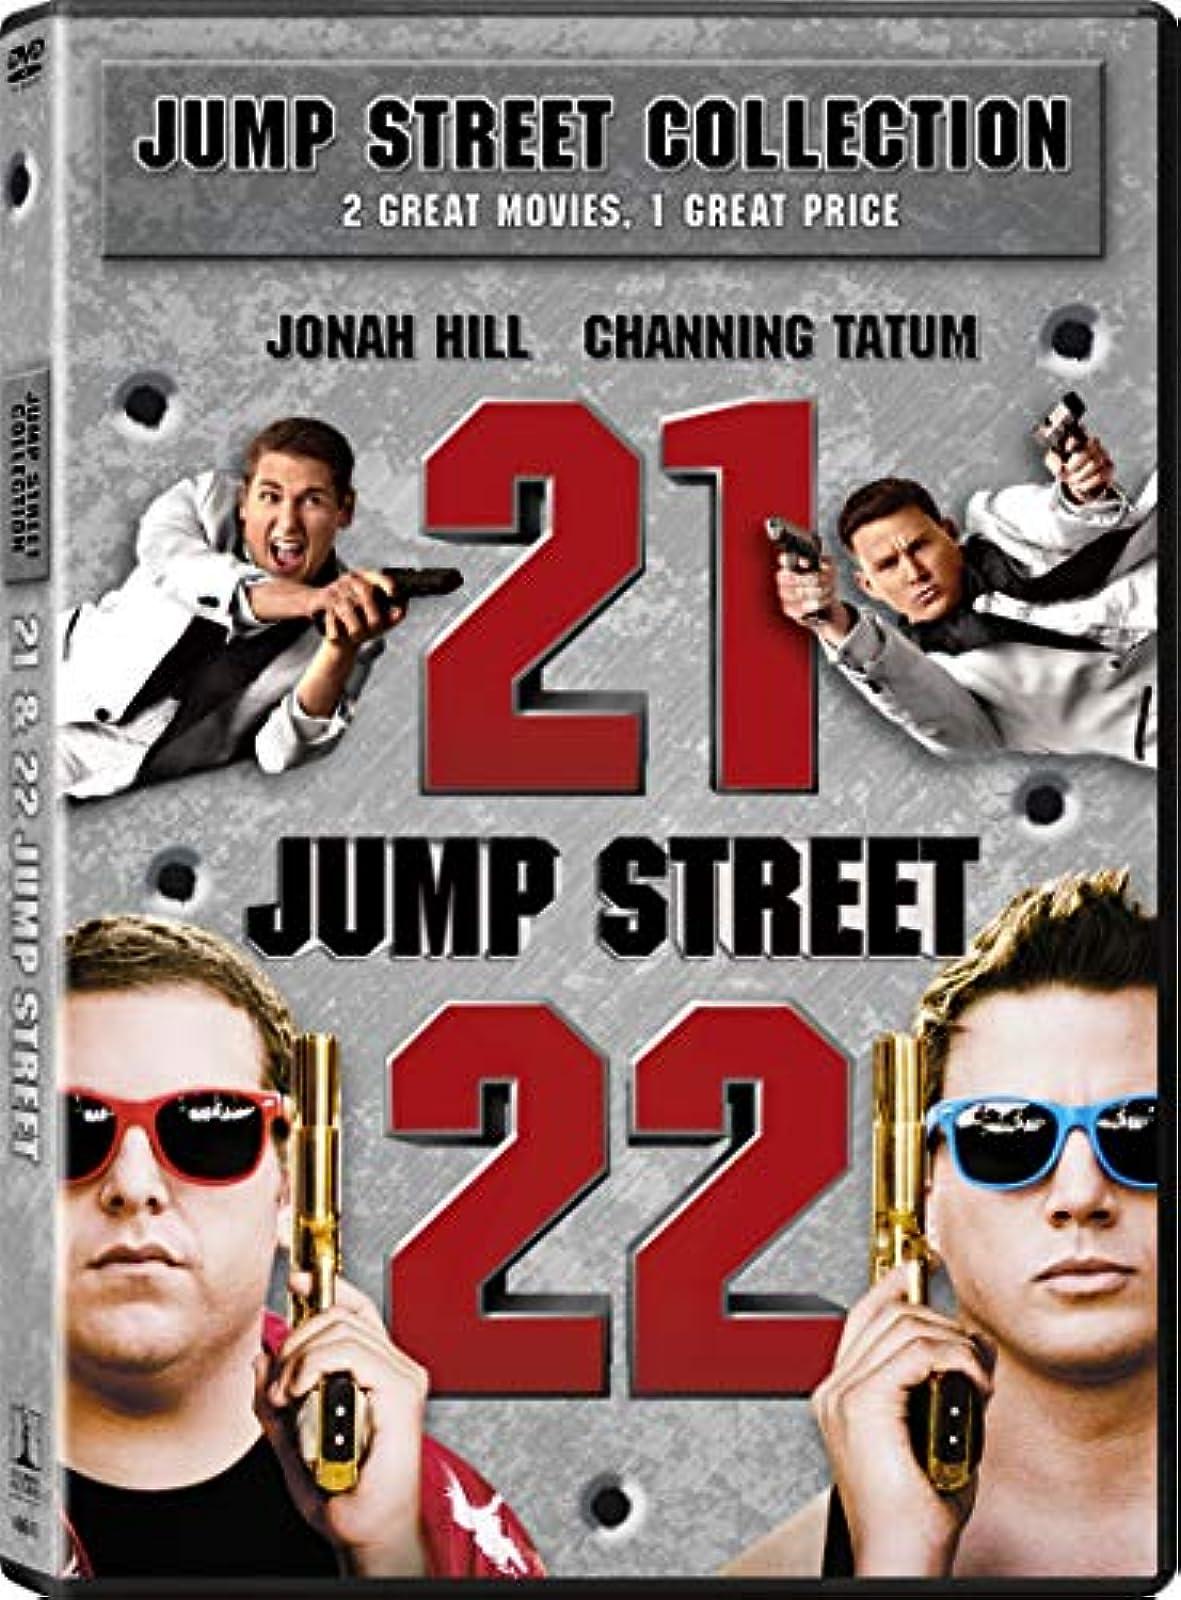 21 Jump Street 2012 / 22 Jump Street Vol On DVD With Tatum Channing Mystery